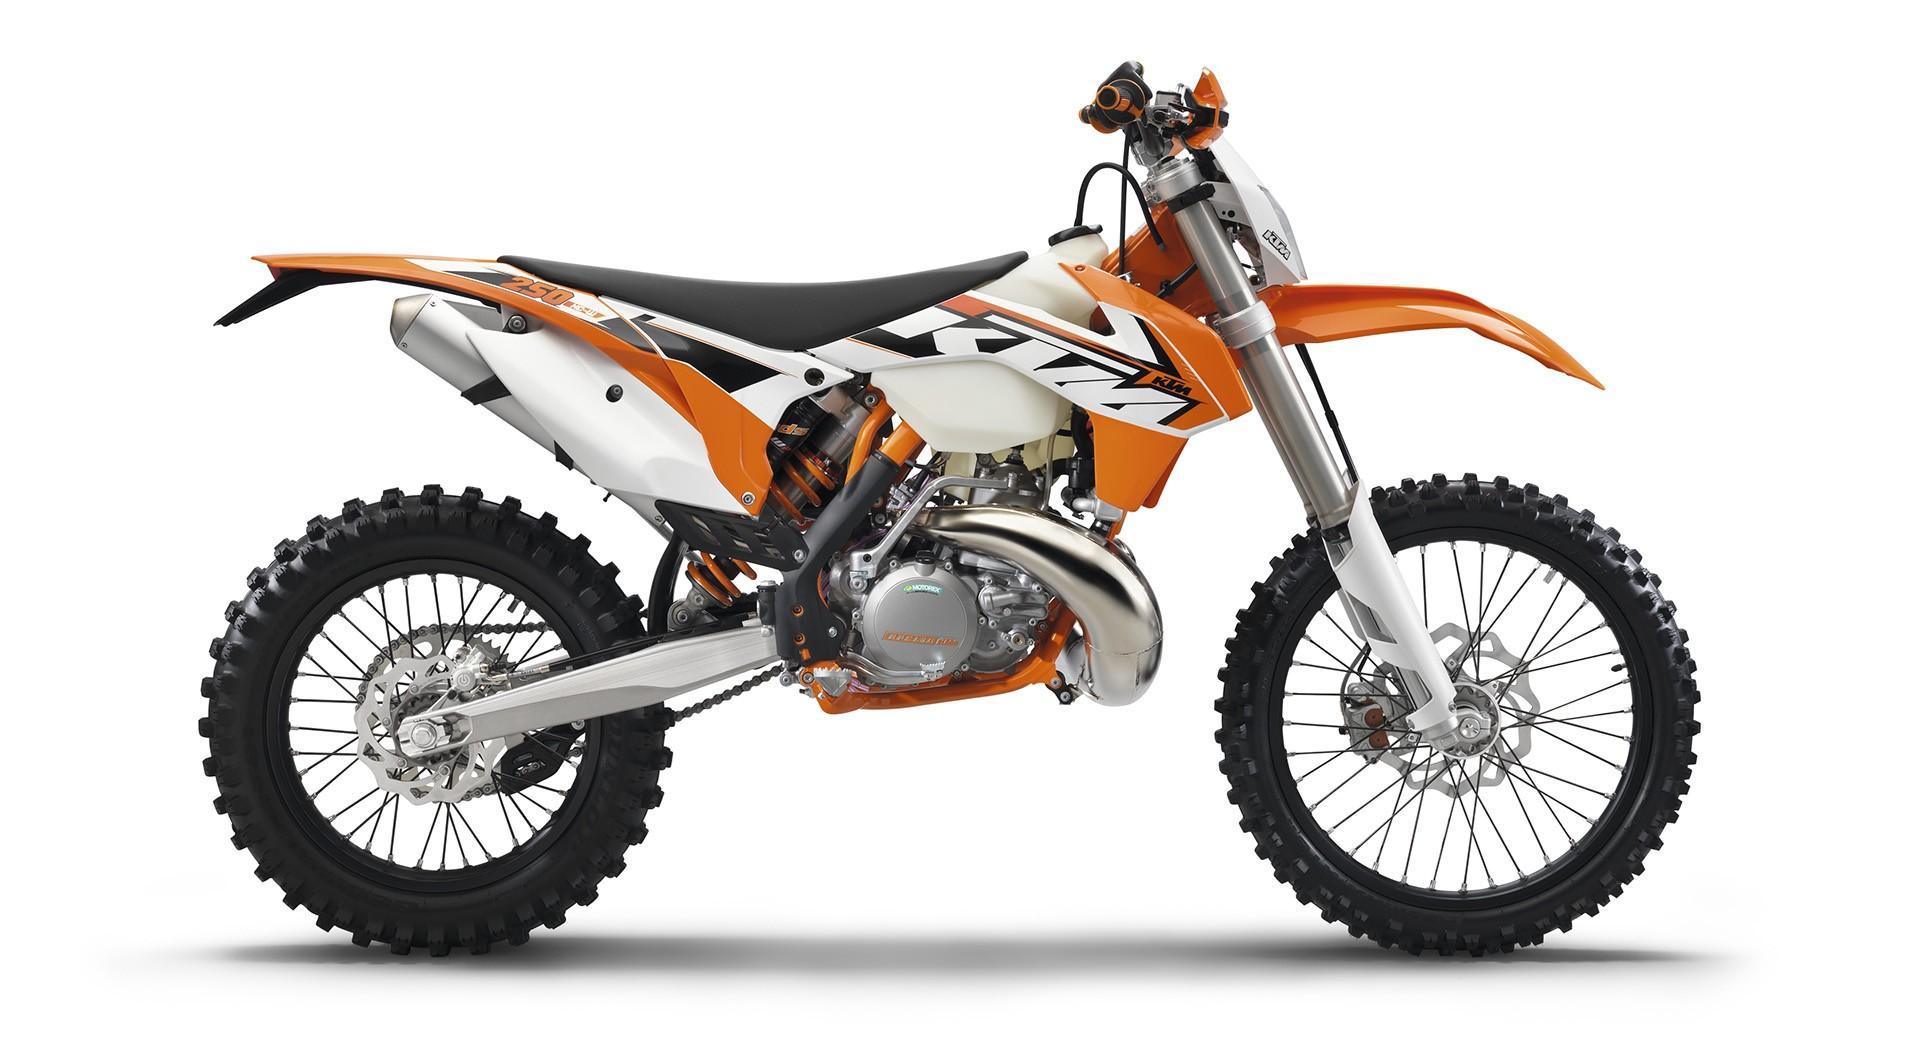 2015 KTM 250 XC in Orange, California